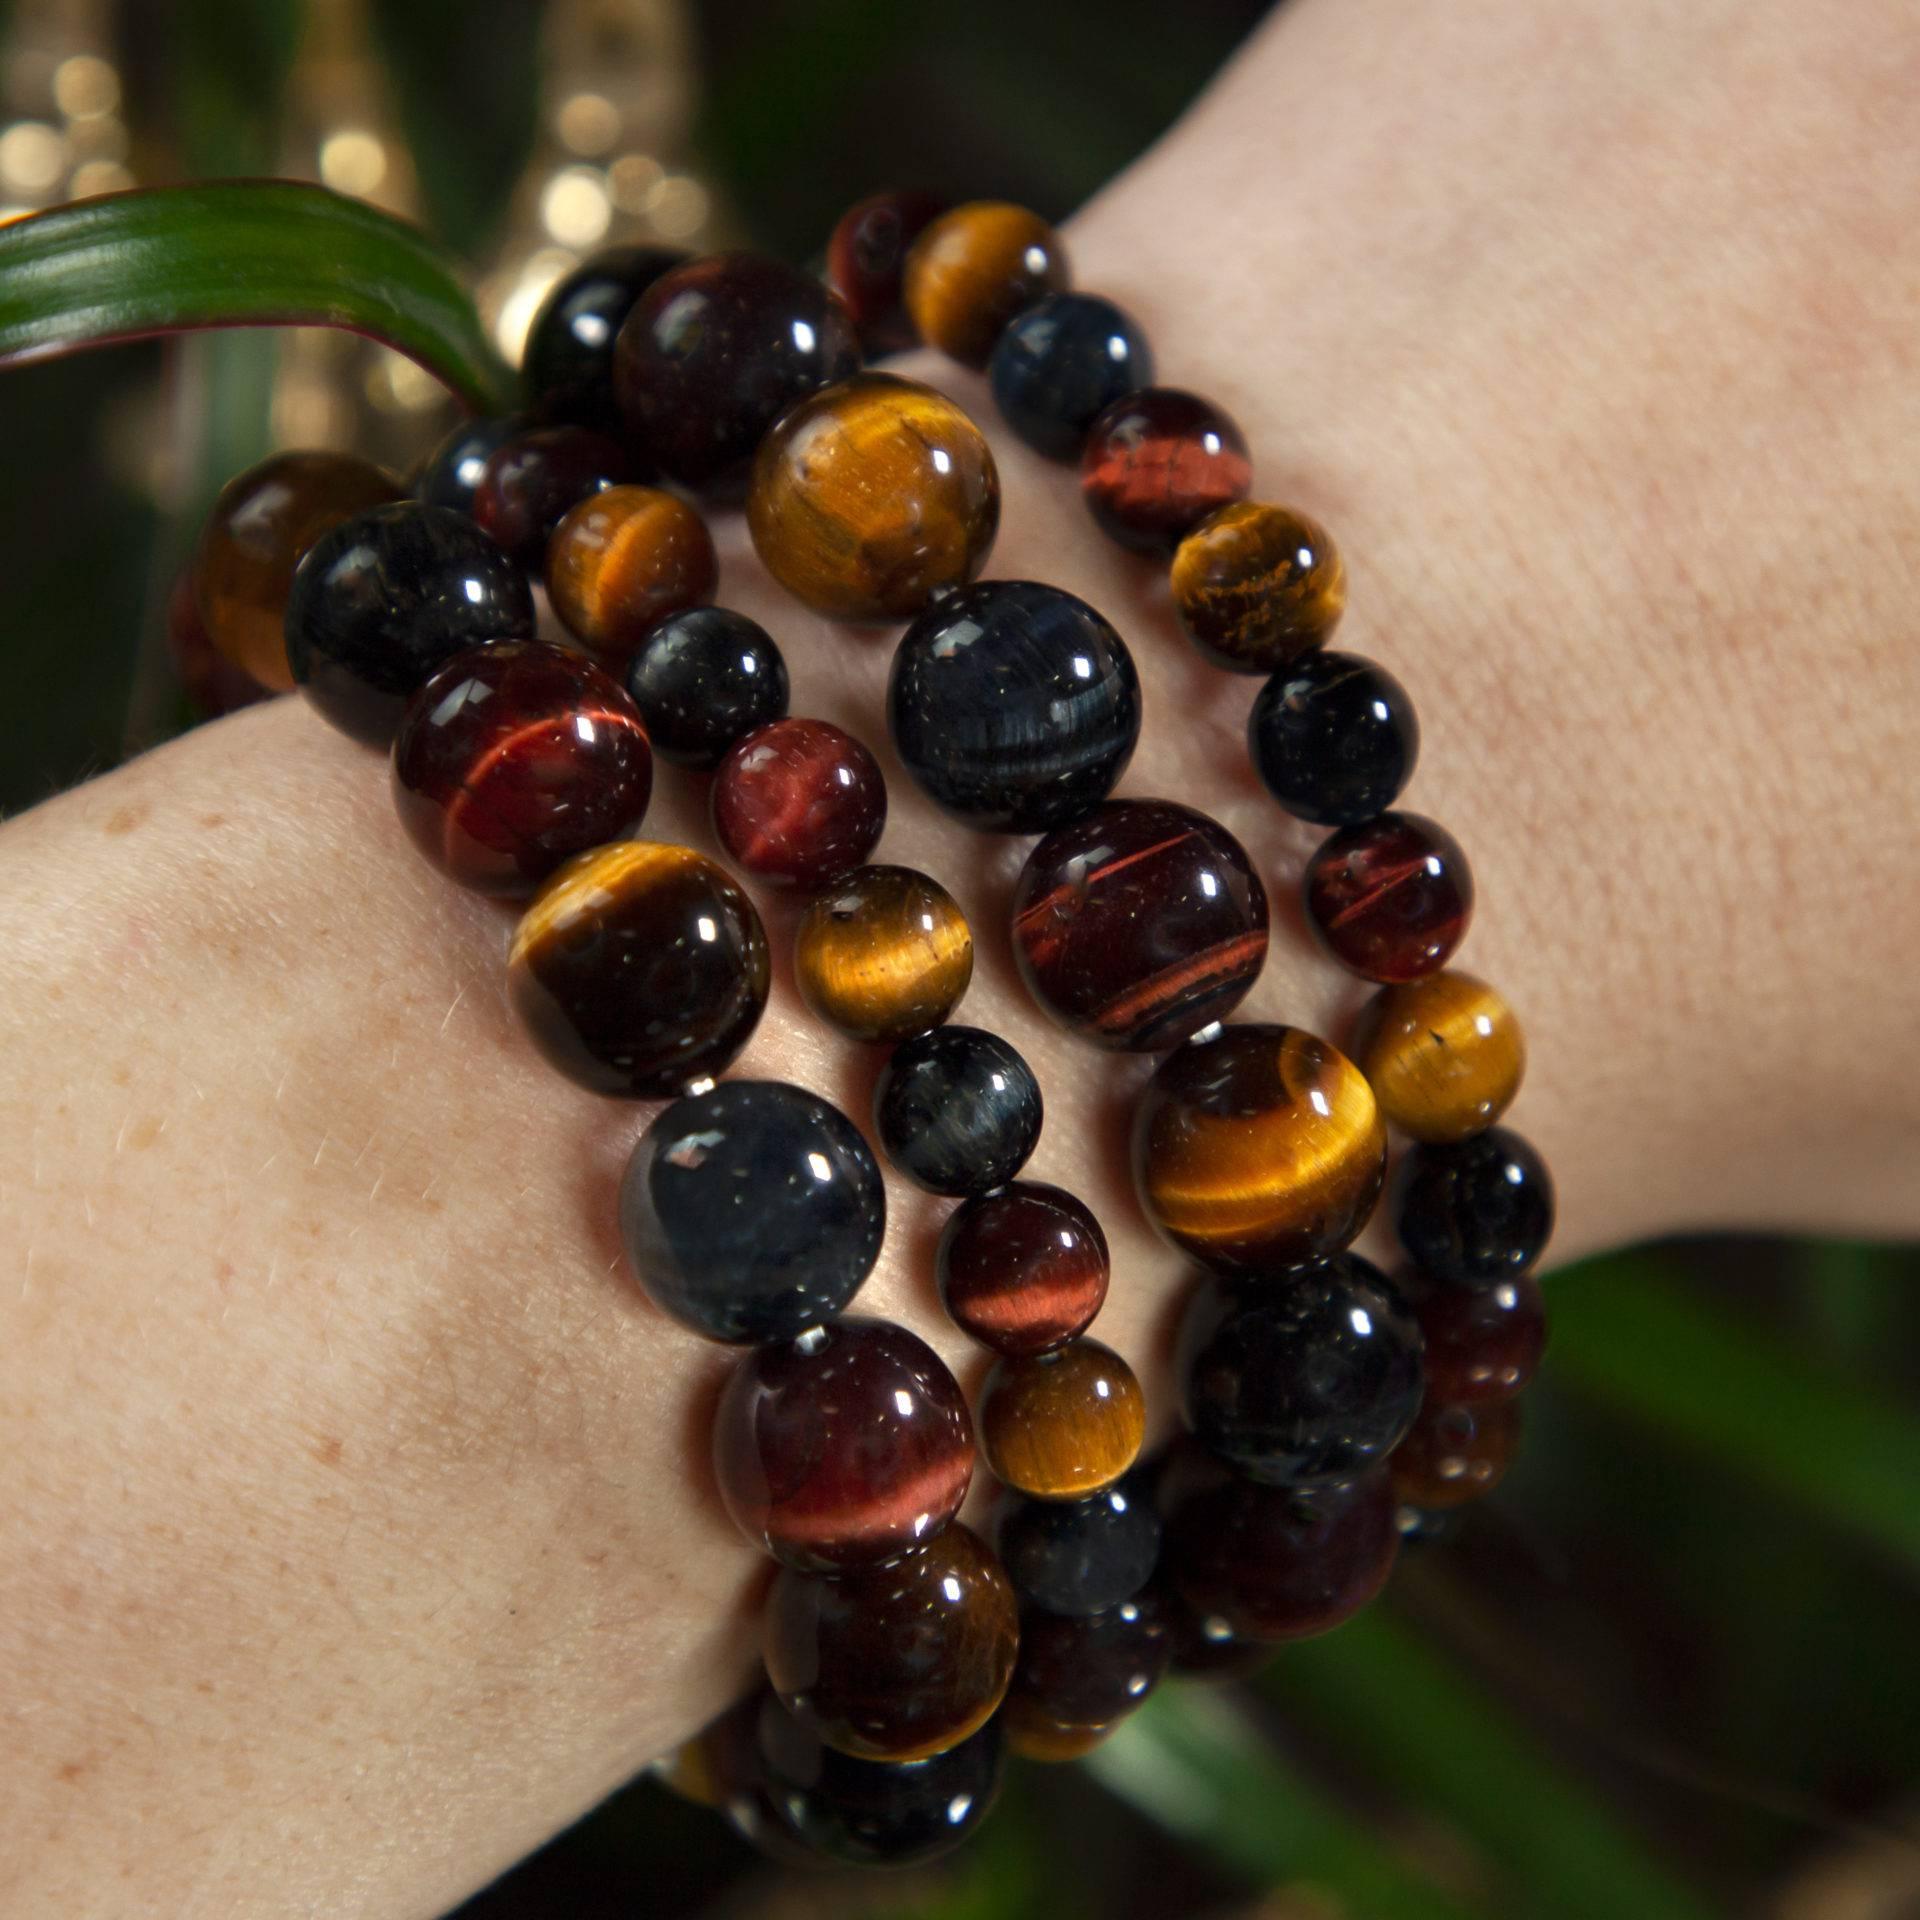 8mm tiger eye bracelet Black onyx bracelet friendship bracelet Women gift leadership good luck stone protection meditation bracelet B272